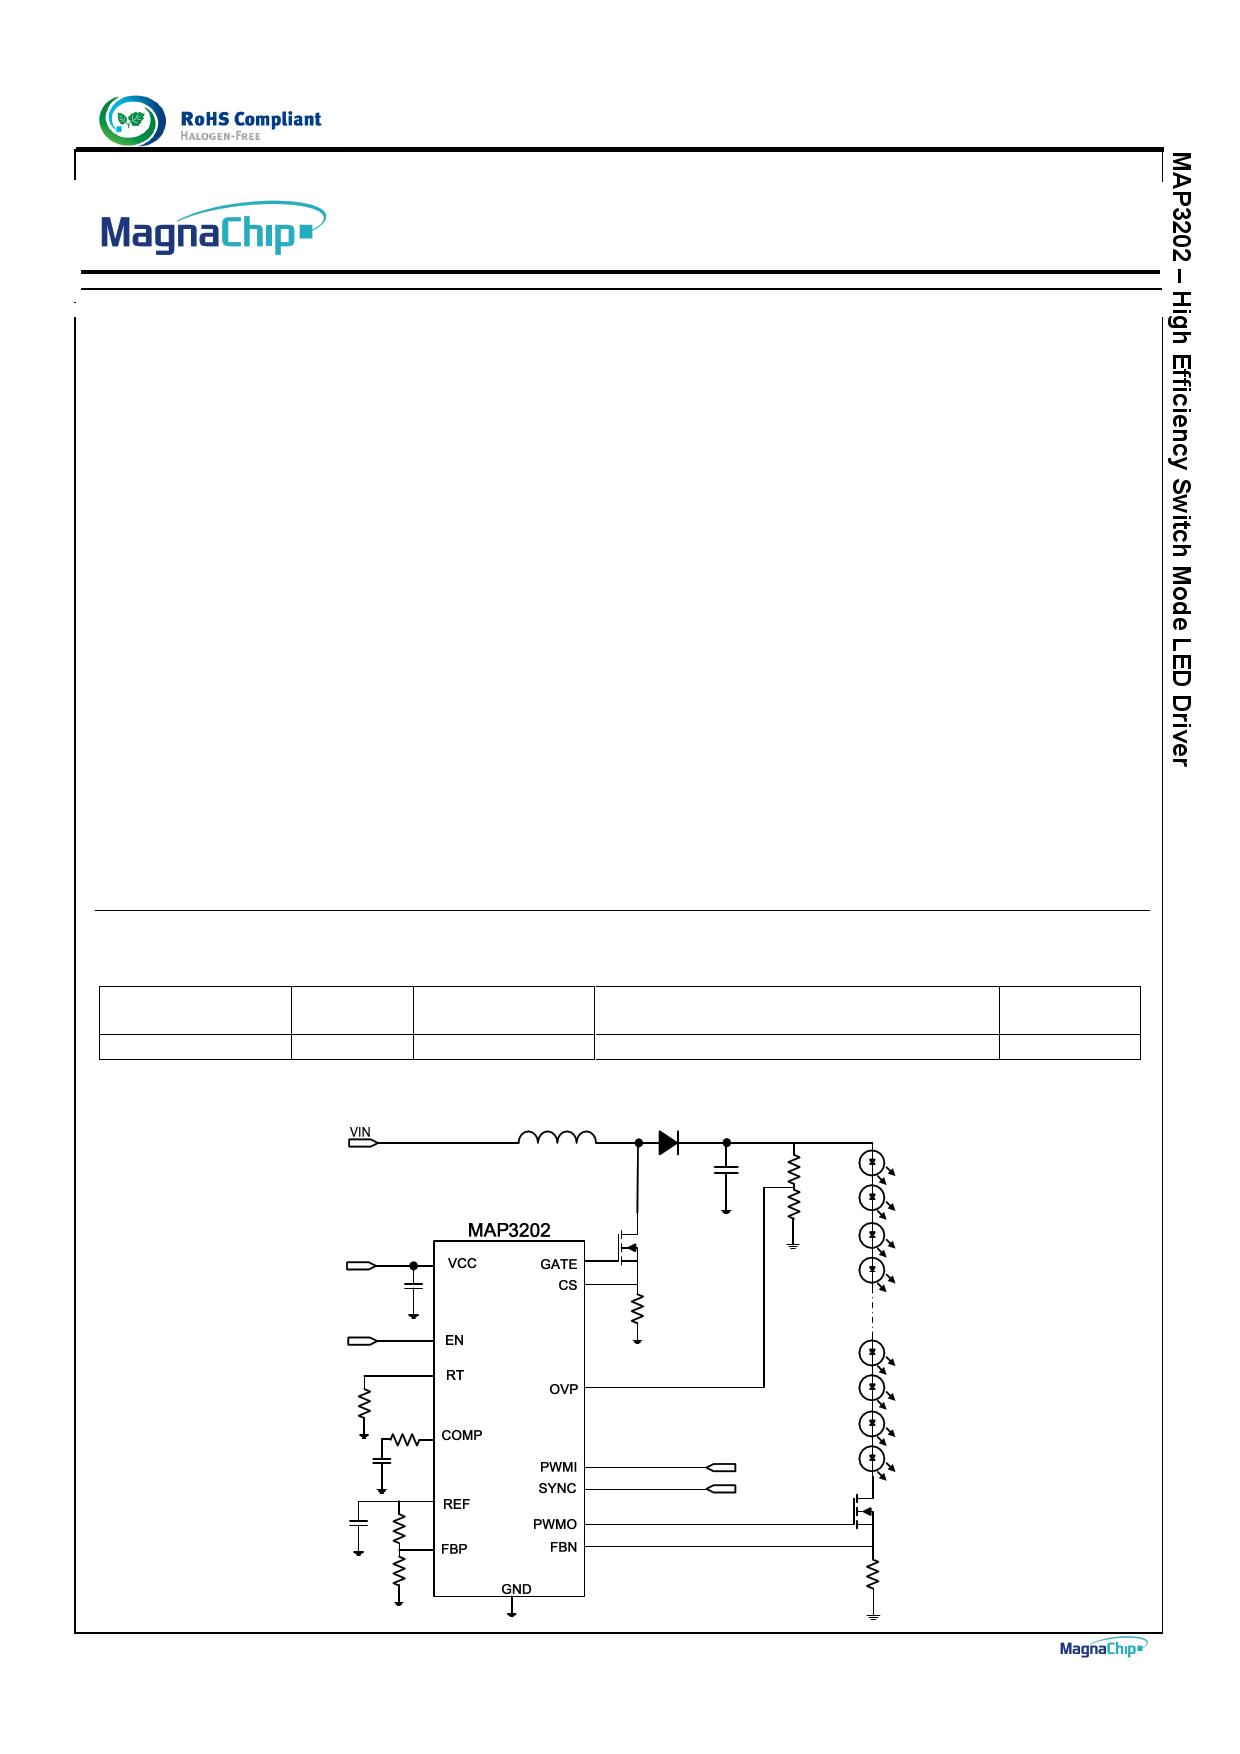 MAP3202 image